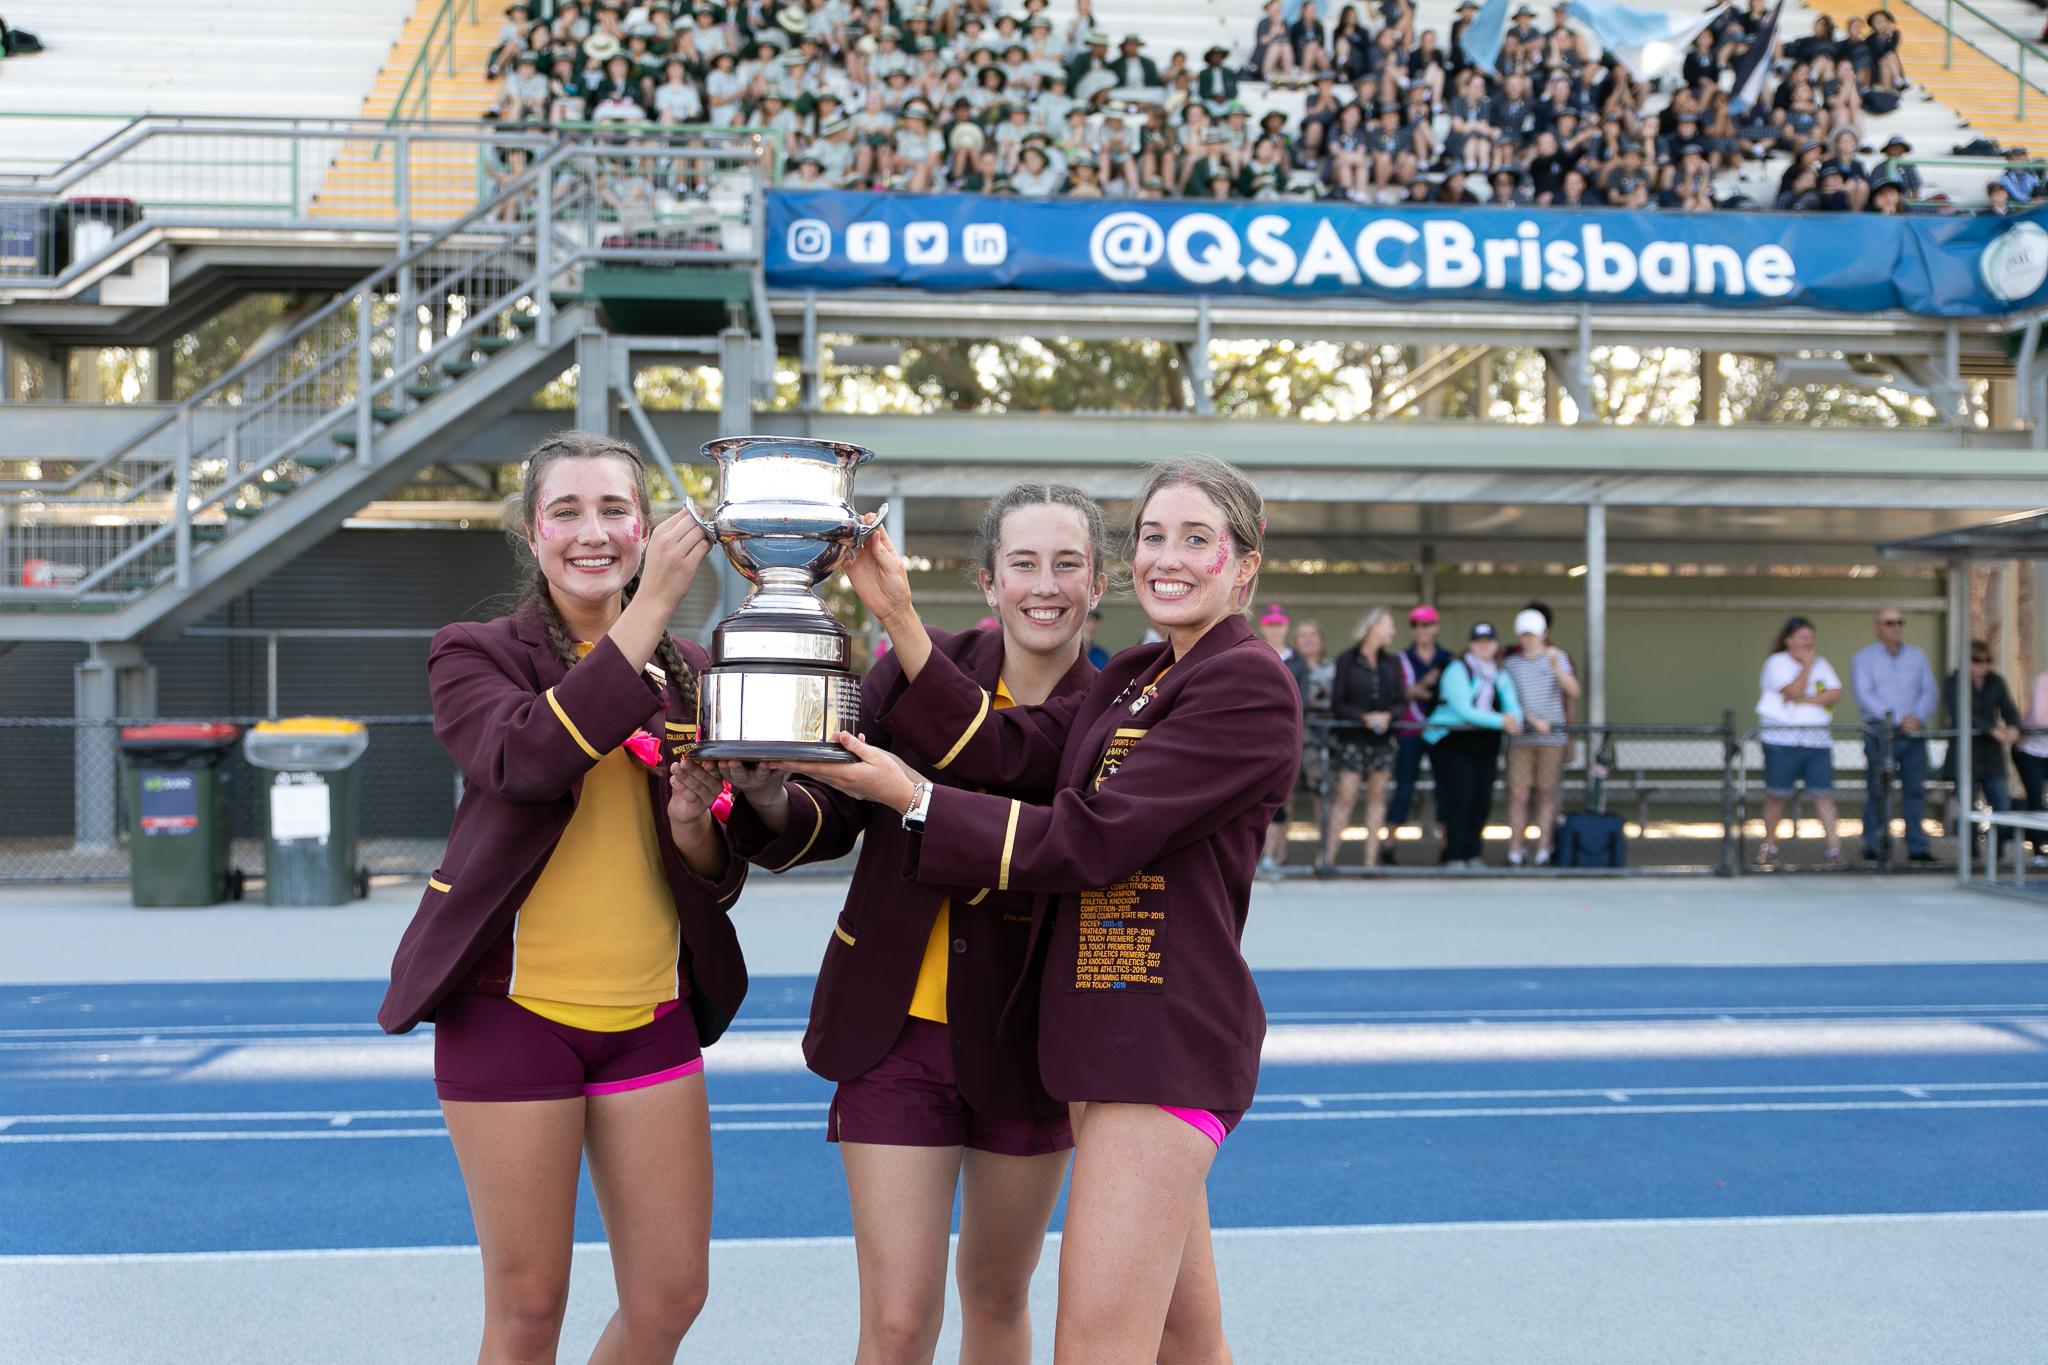 MBC wins fourth QGSSSA athletics Stephen's Cup